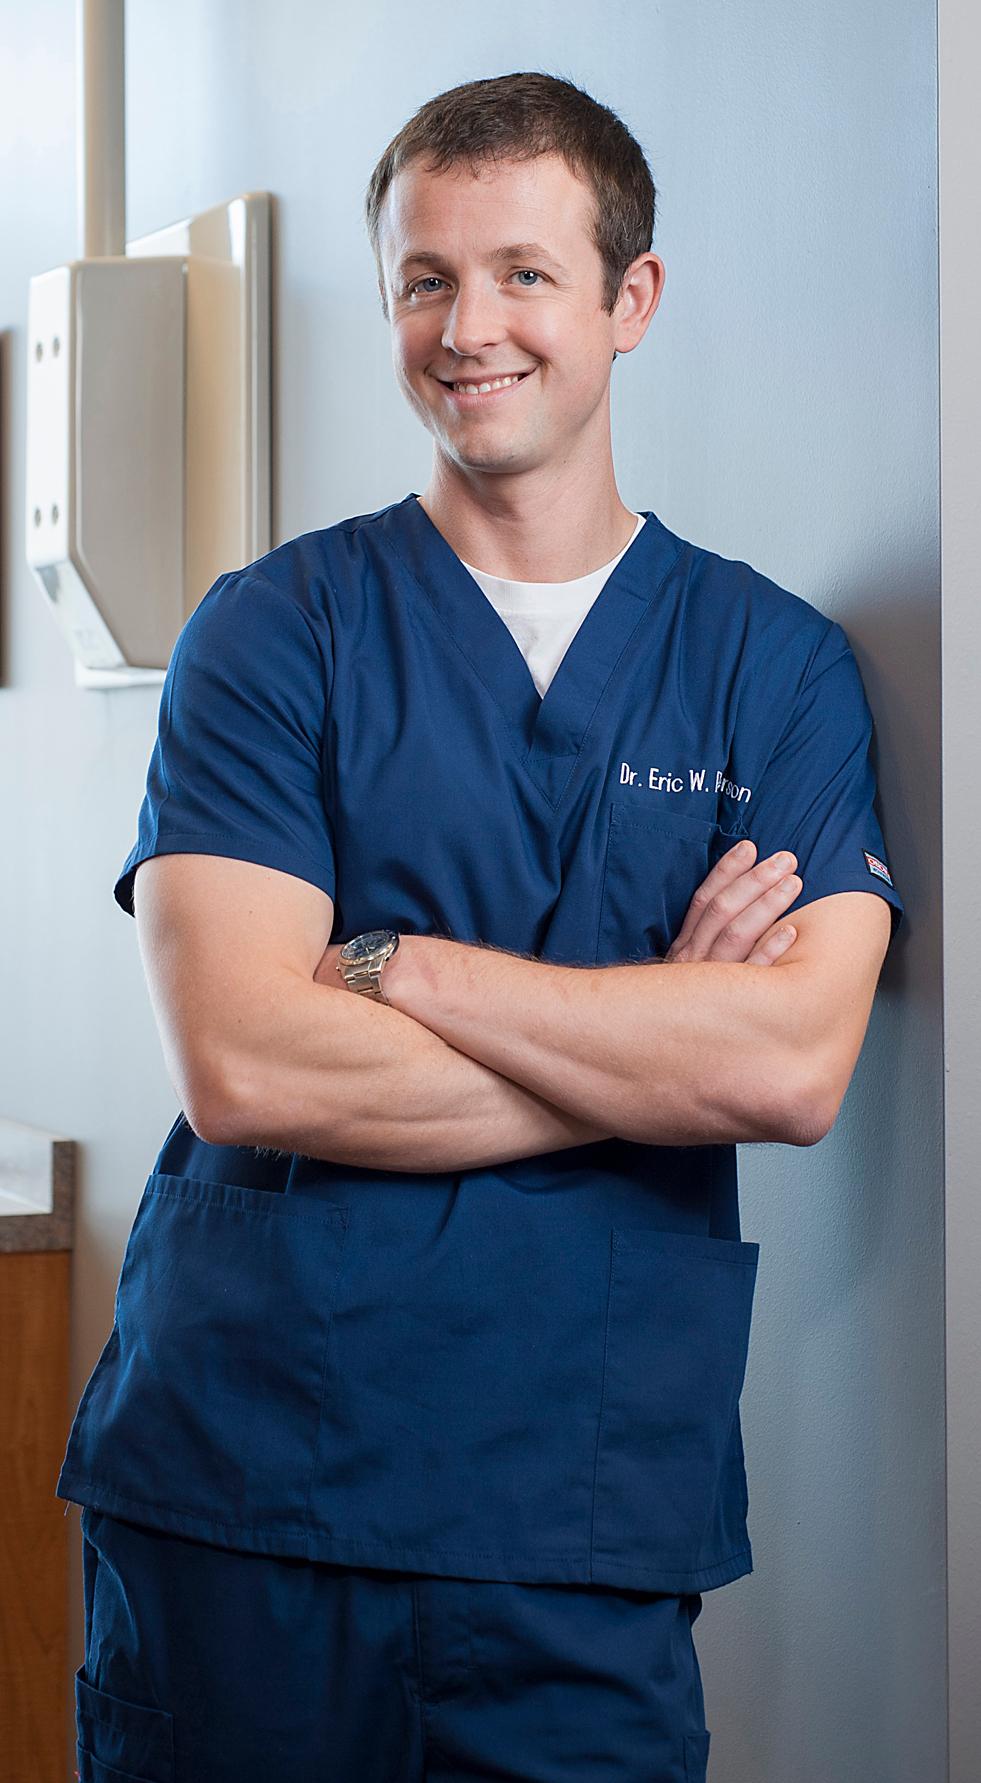 Dr. Eric Peterson